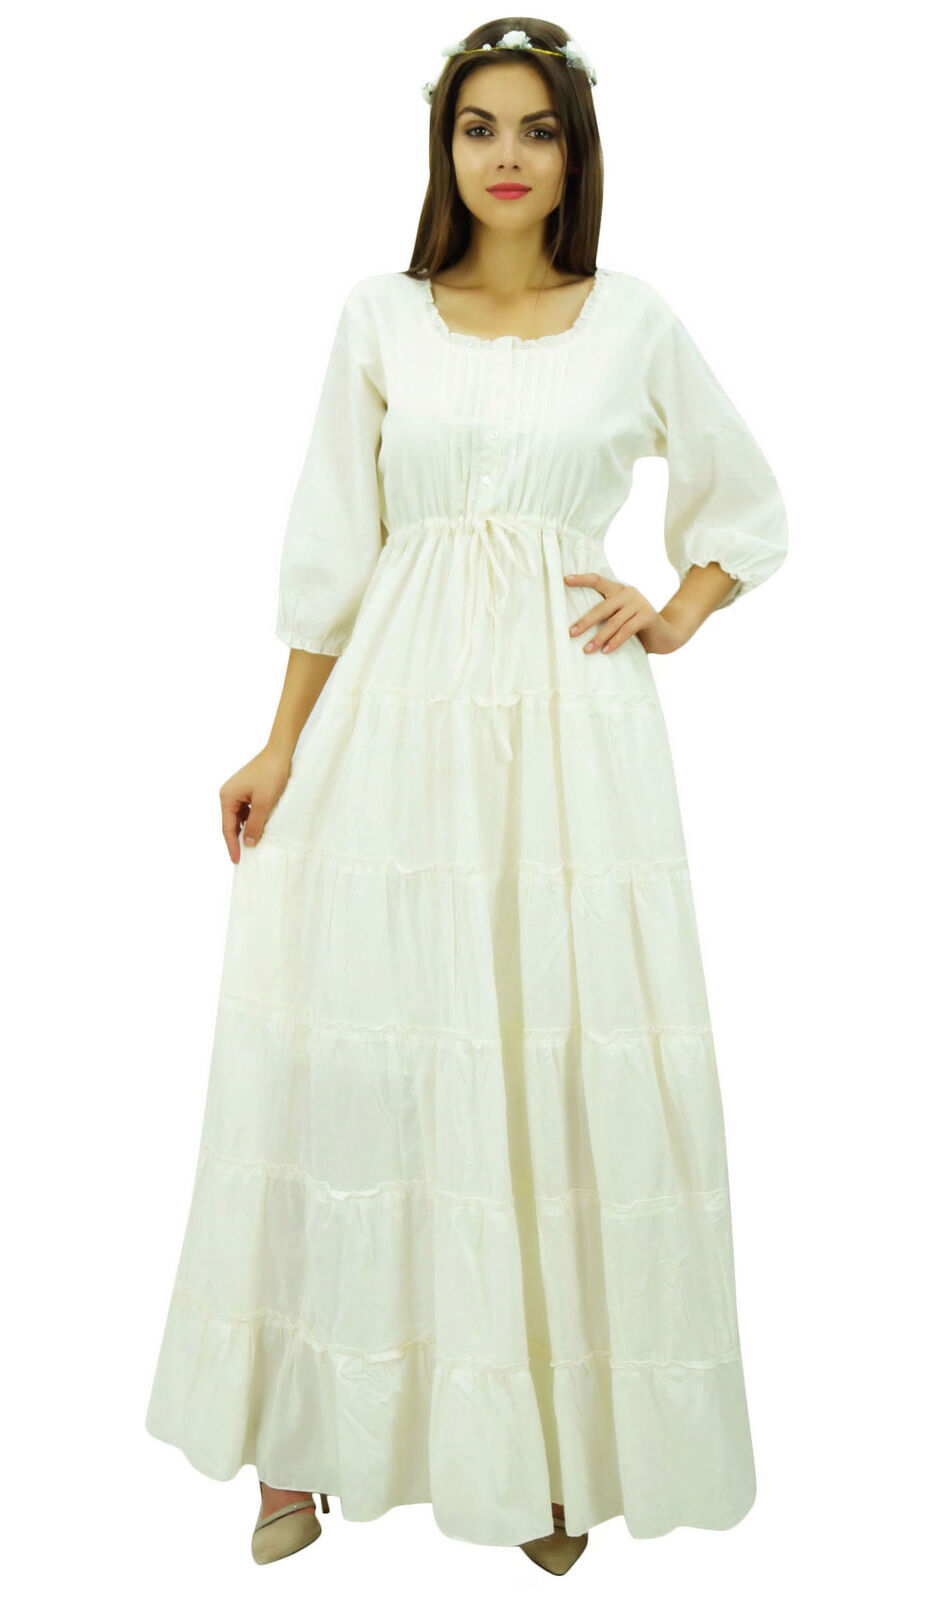 Bimba Off White 3 4 Sleeve Summer Cotton Maxi Drawstring Waist Boho Dresses